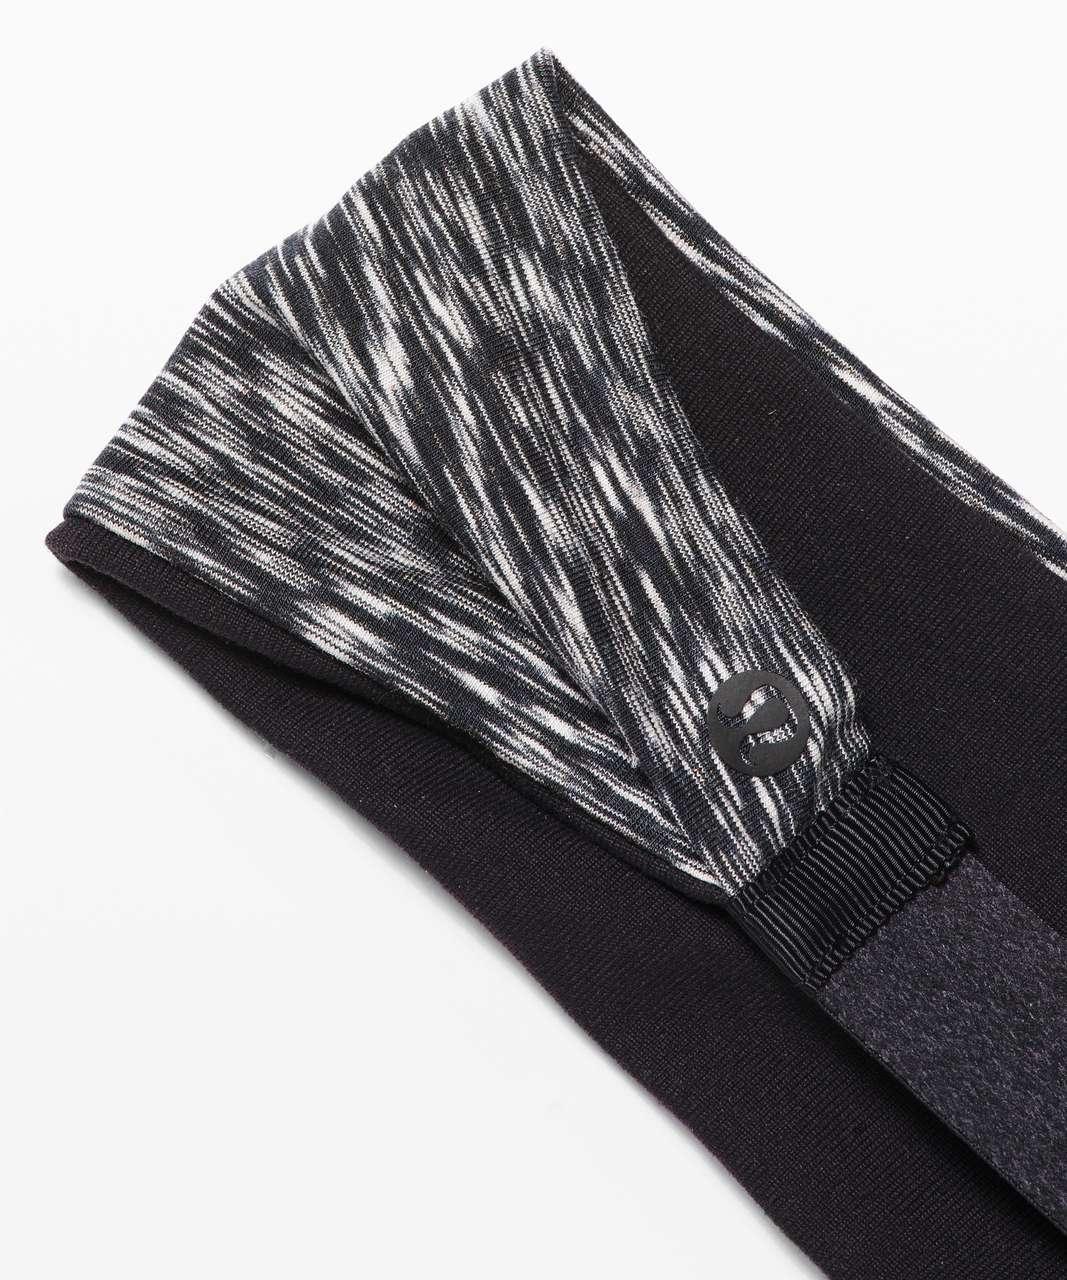 Lululemon Fringe Fighter Headband - Black / Spaced Out Space Dye Black White